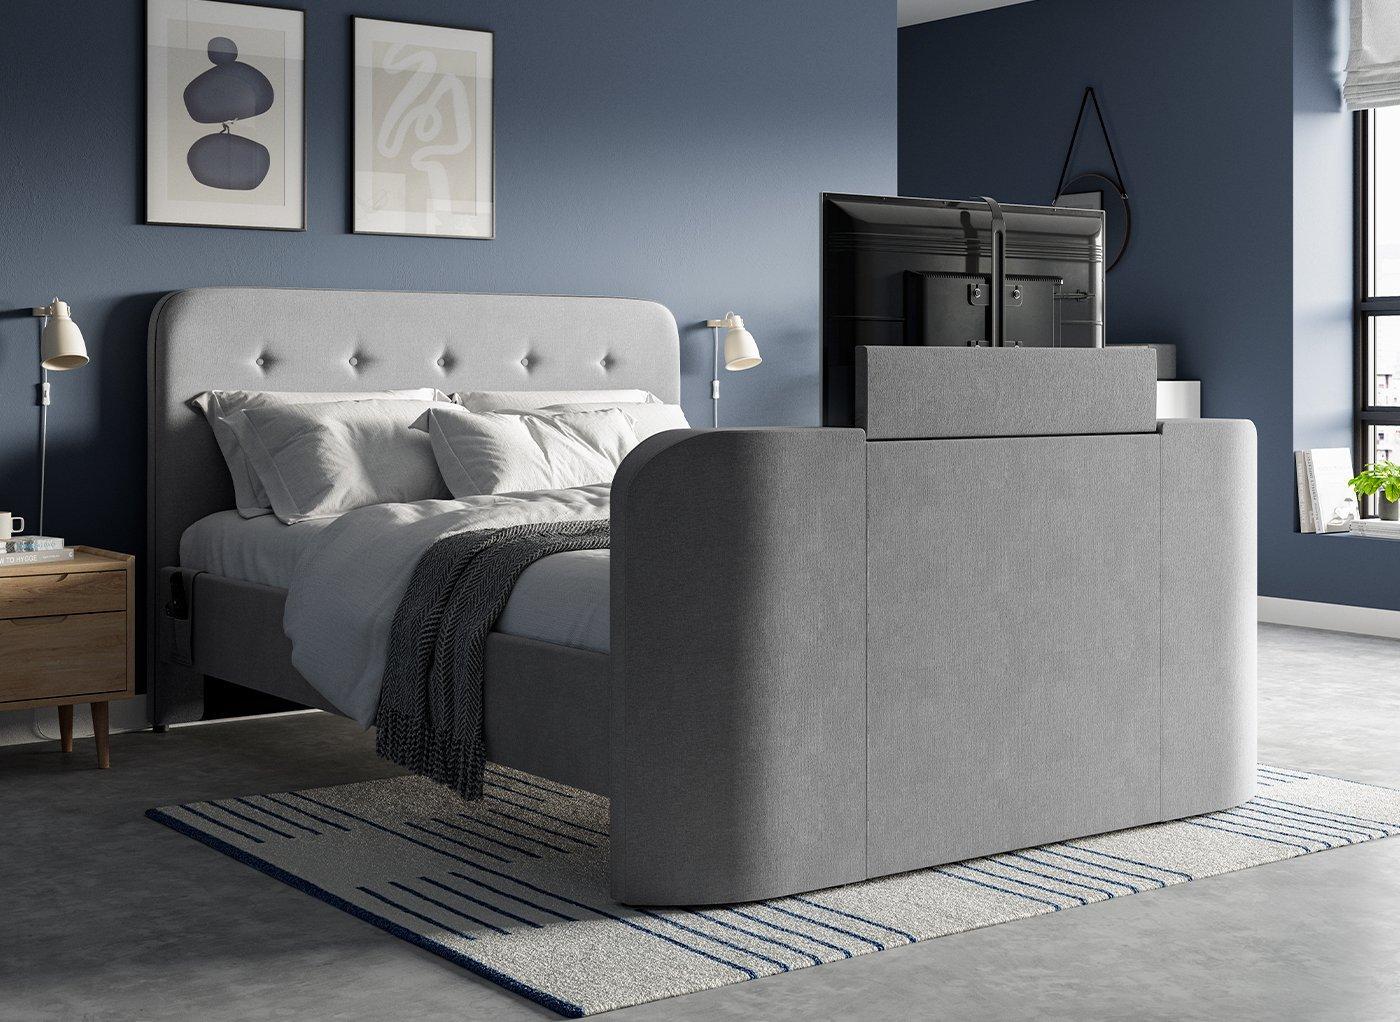 blakely-upholstered-smart-led-tv-bed-frame